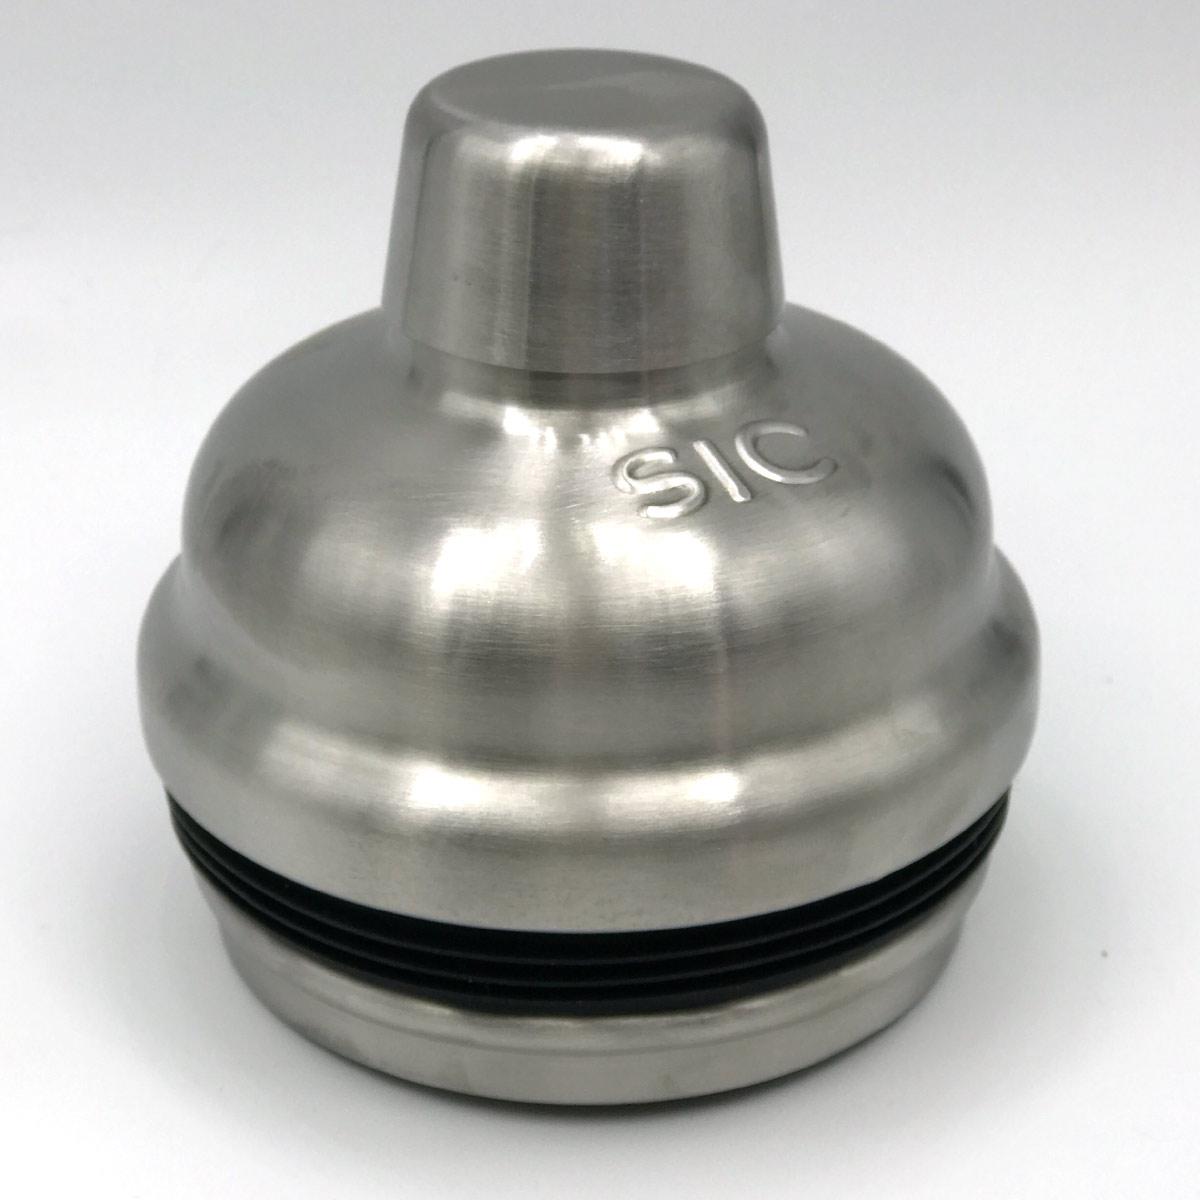 SIC-Cups-30-oz-cocktail-shaker-lid-fits-yeti-ozark-trail-polar-camel-tumblers-stainless-steel-lazerworx